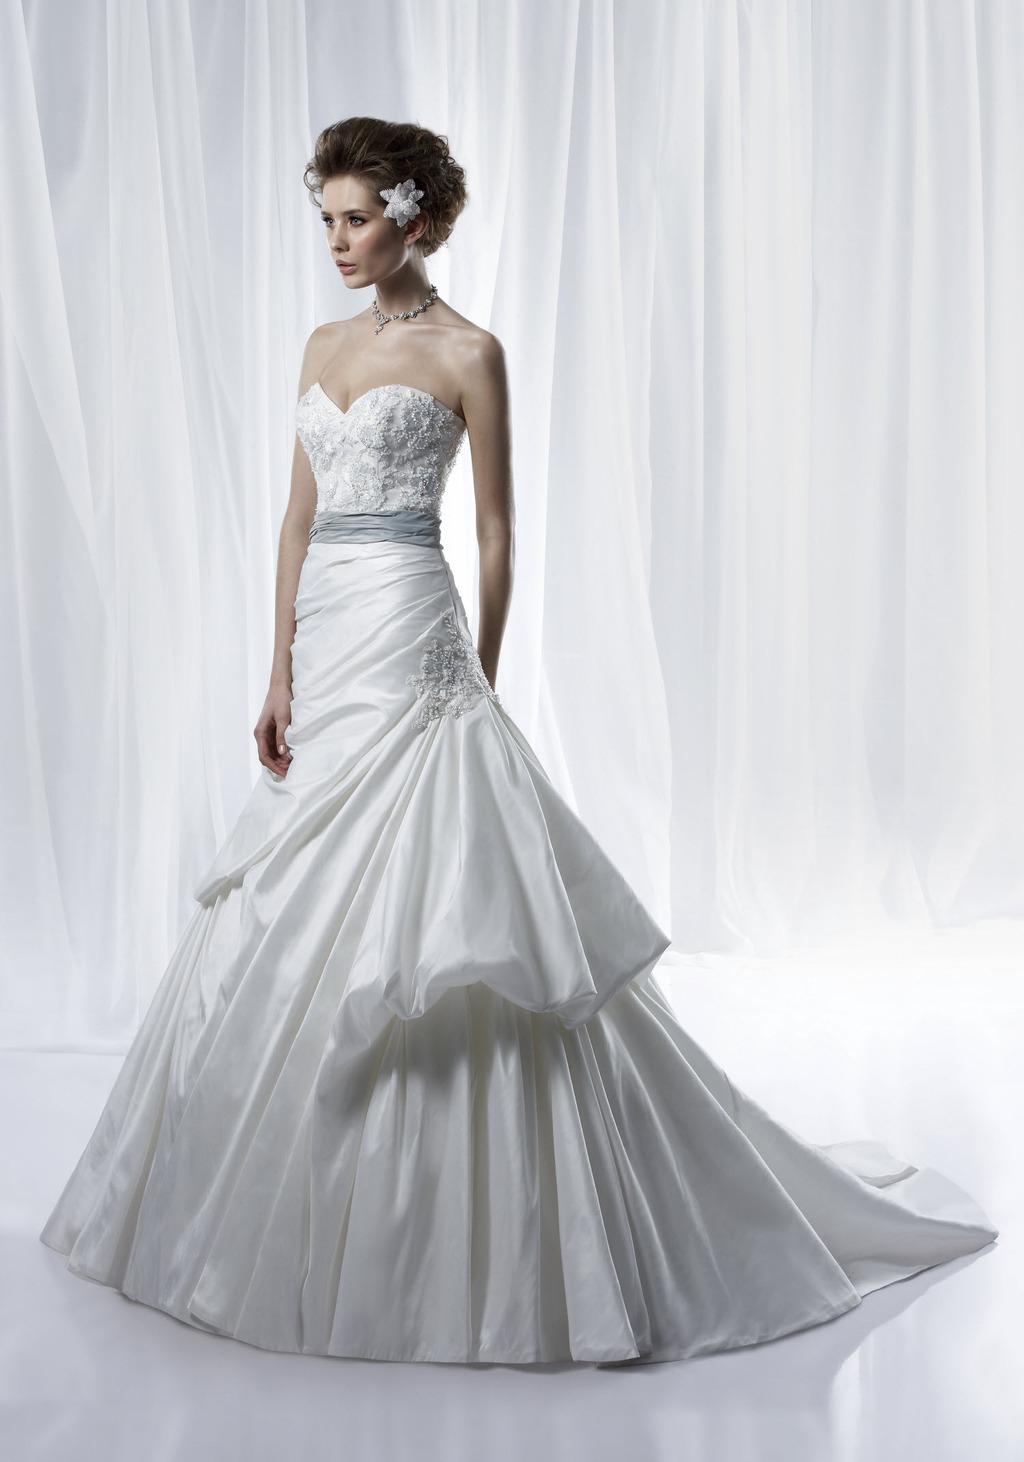 Spring-2012-wedding-dress-anjolique-corset-bodice-beading-applique-drop-waist-a-line-skirt-bridal-gown.full